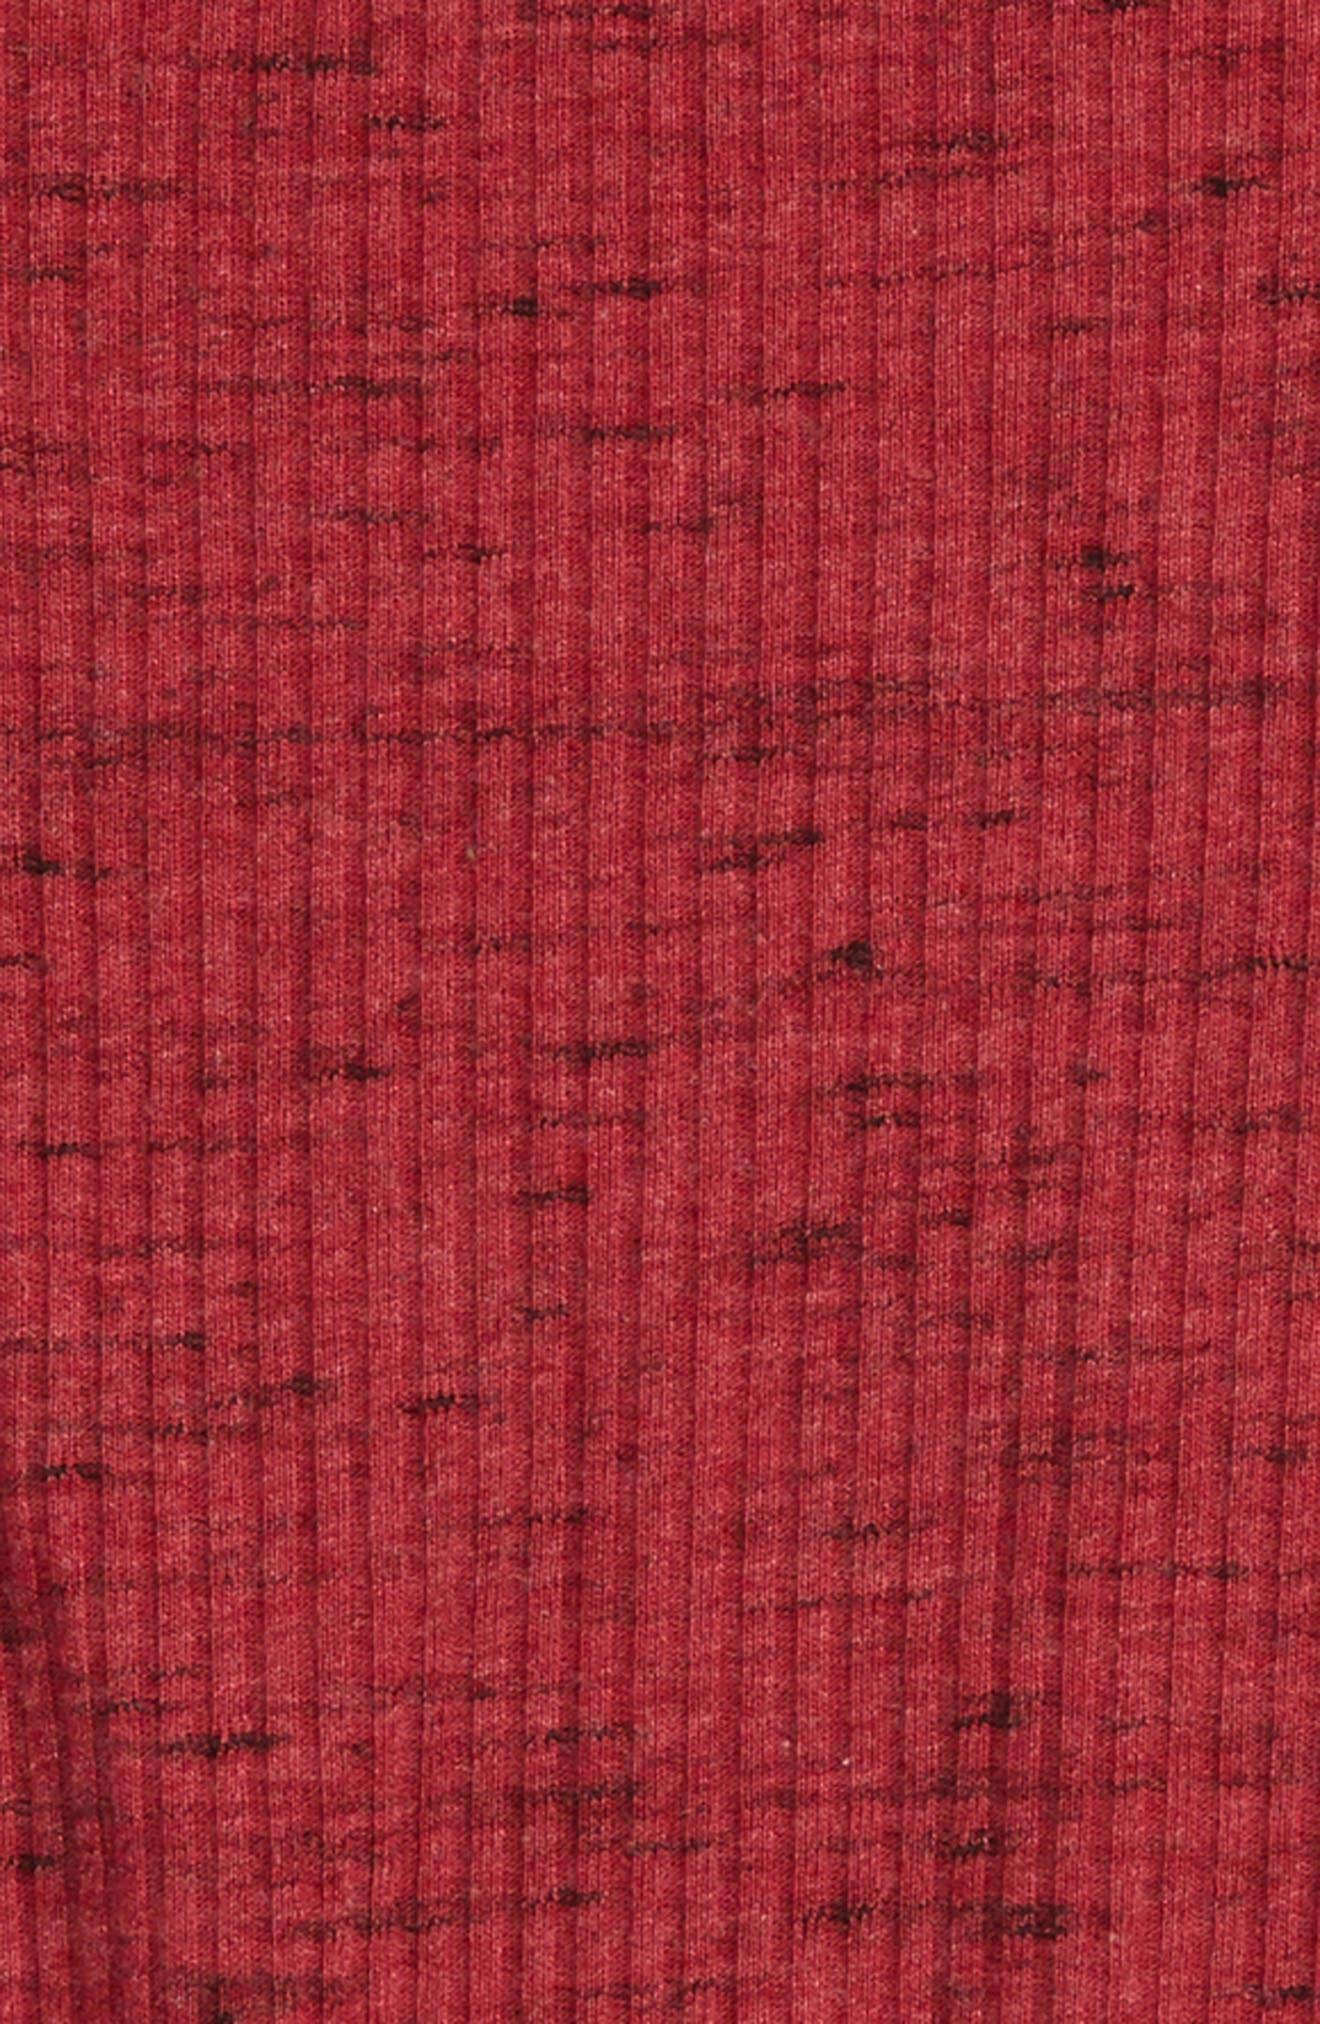 Cutout Rib Knit Tee,                             Alternate thumbnail 2, color,                             Red Tibetan Spacedye